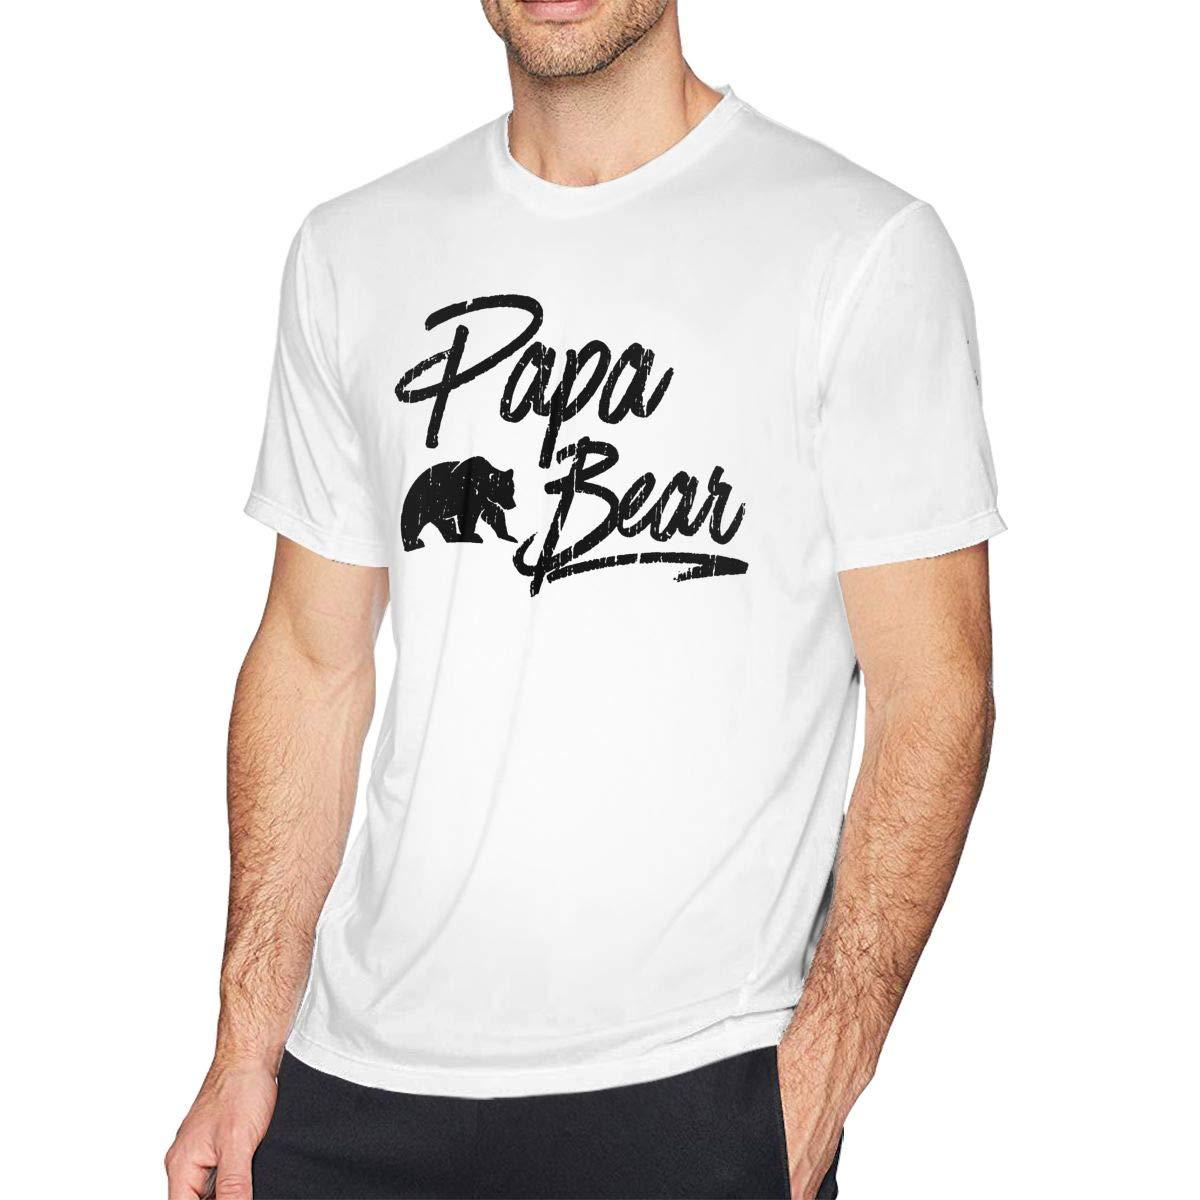 Papa Bear S Crew Neck Short Sleeve Tshirt Casual Shirt For